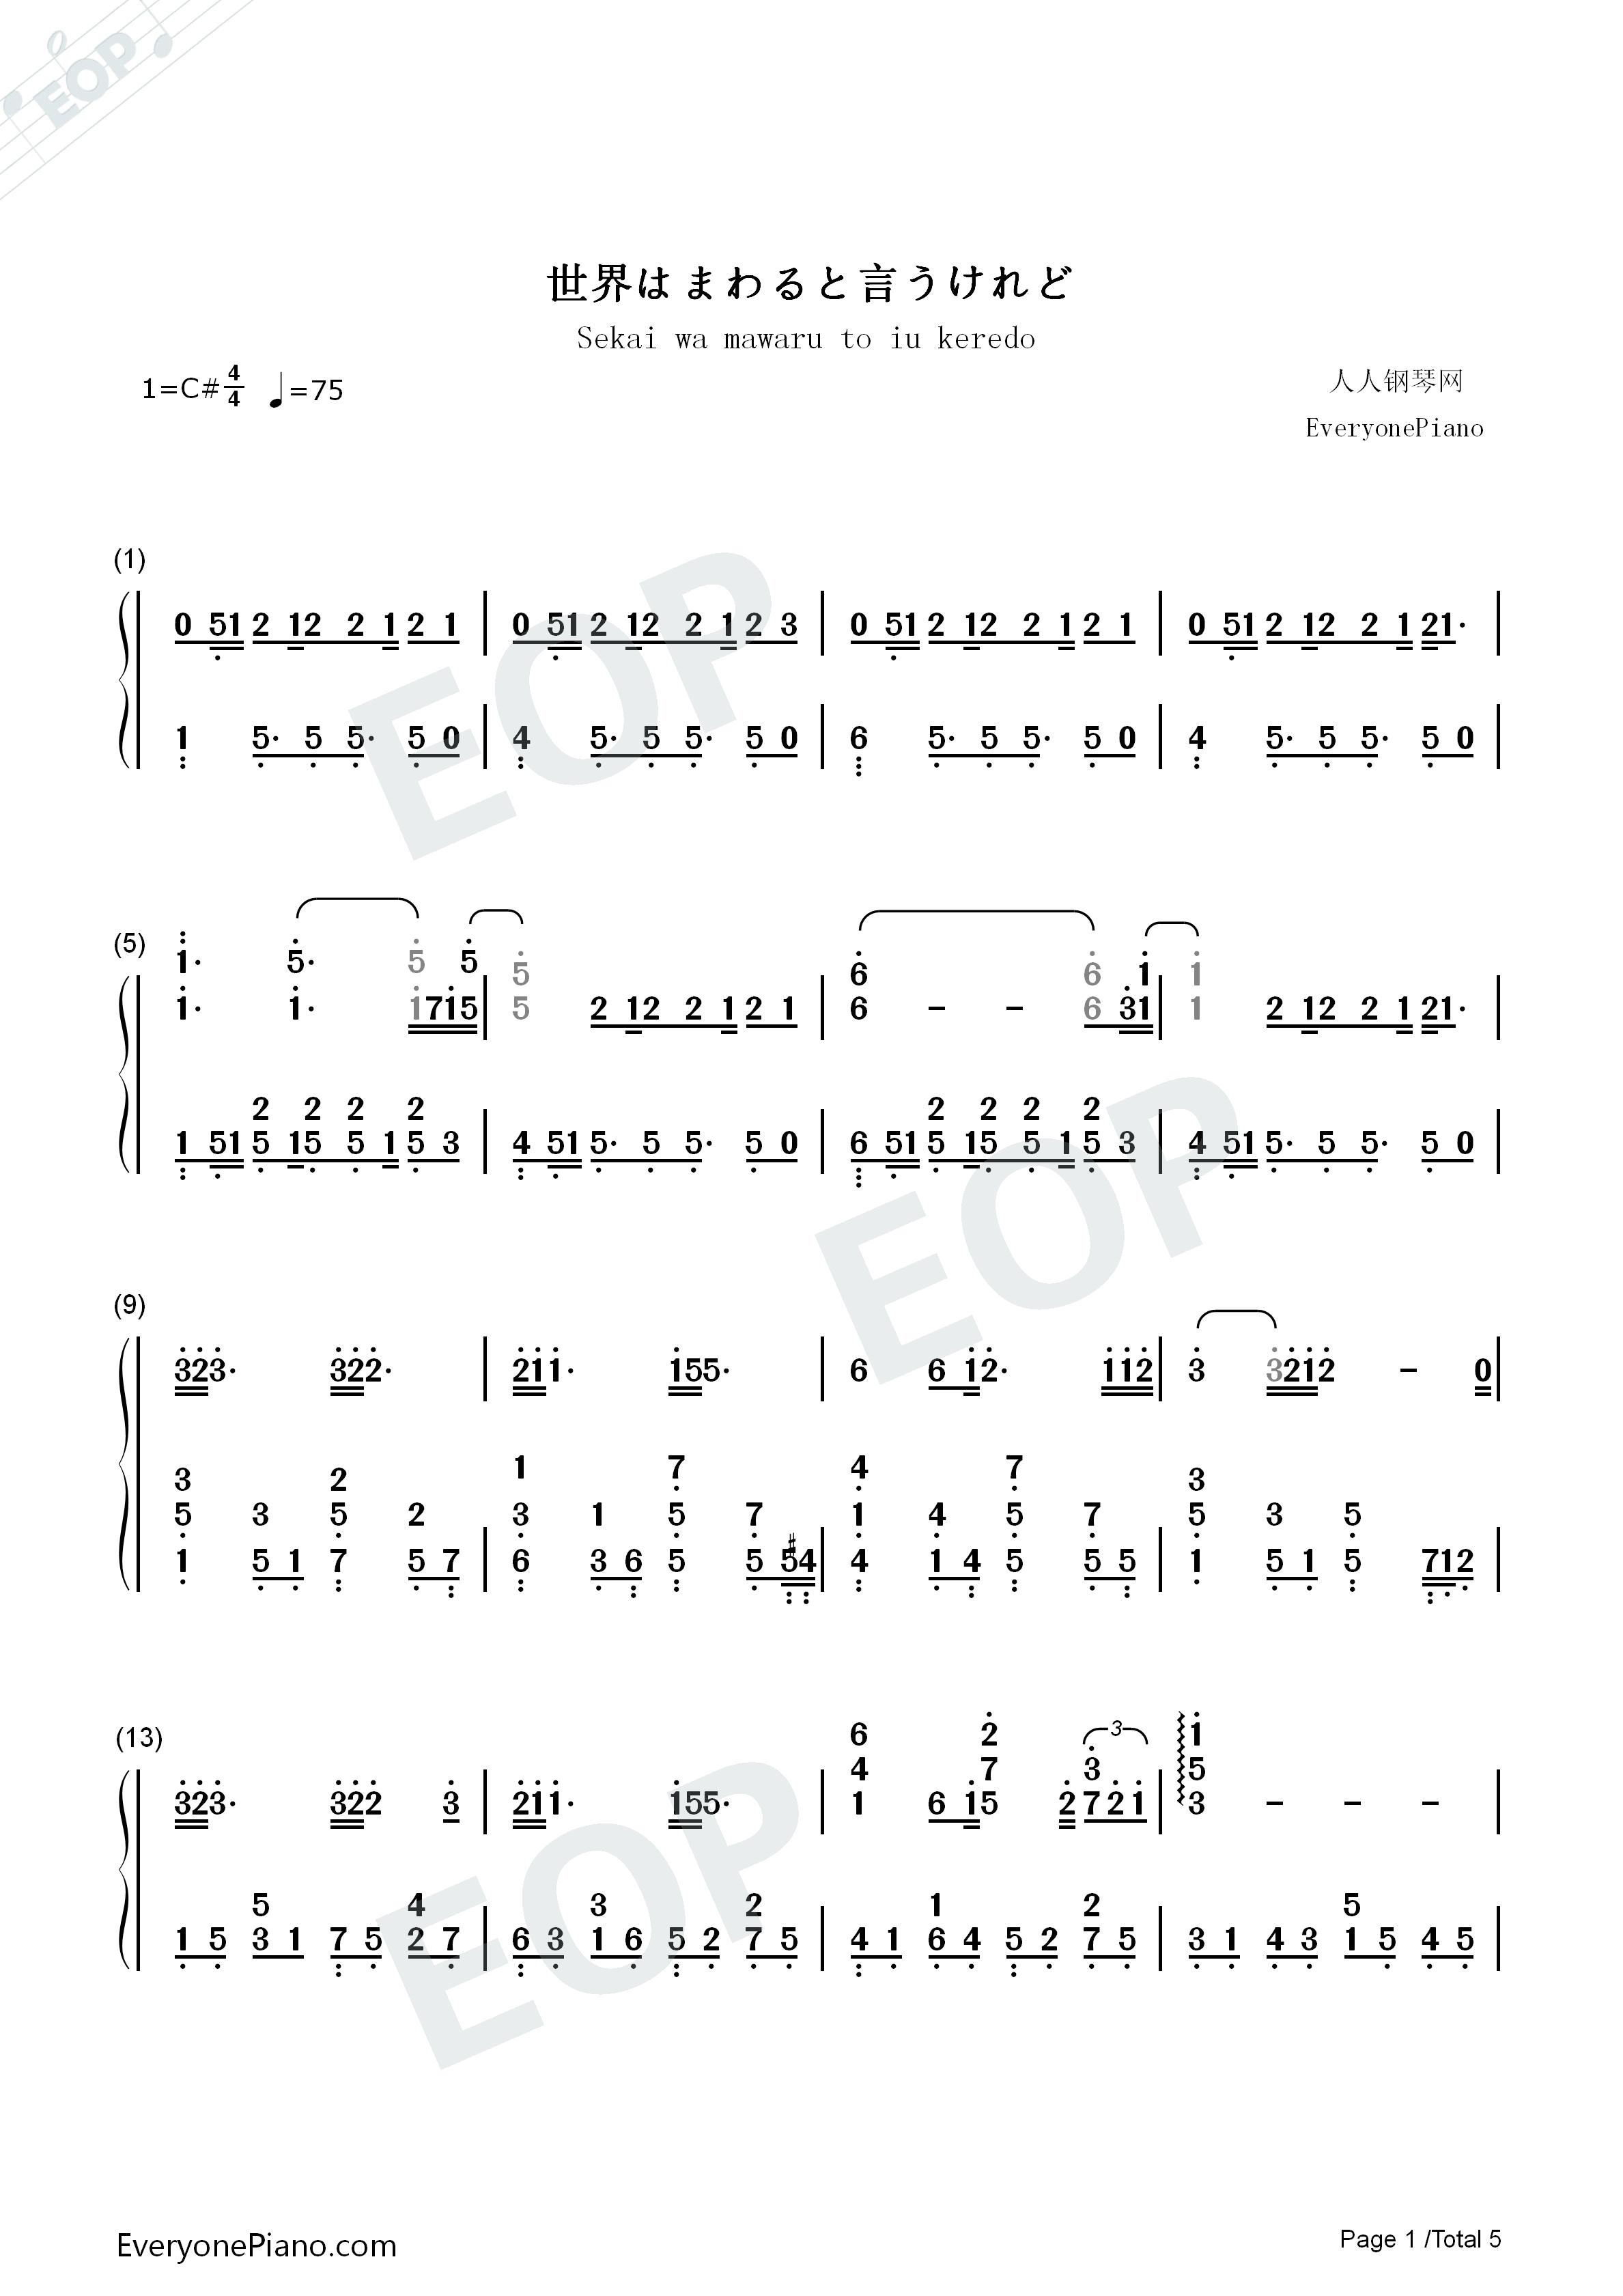 Sekai wa mawaru to iu keredo-Case Closed ED3 Numbered Musical Notation Preview 1